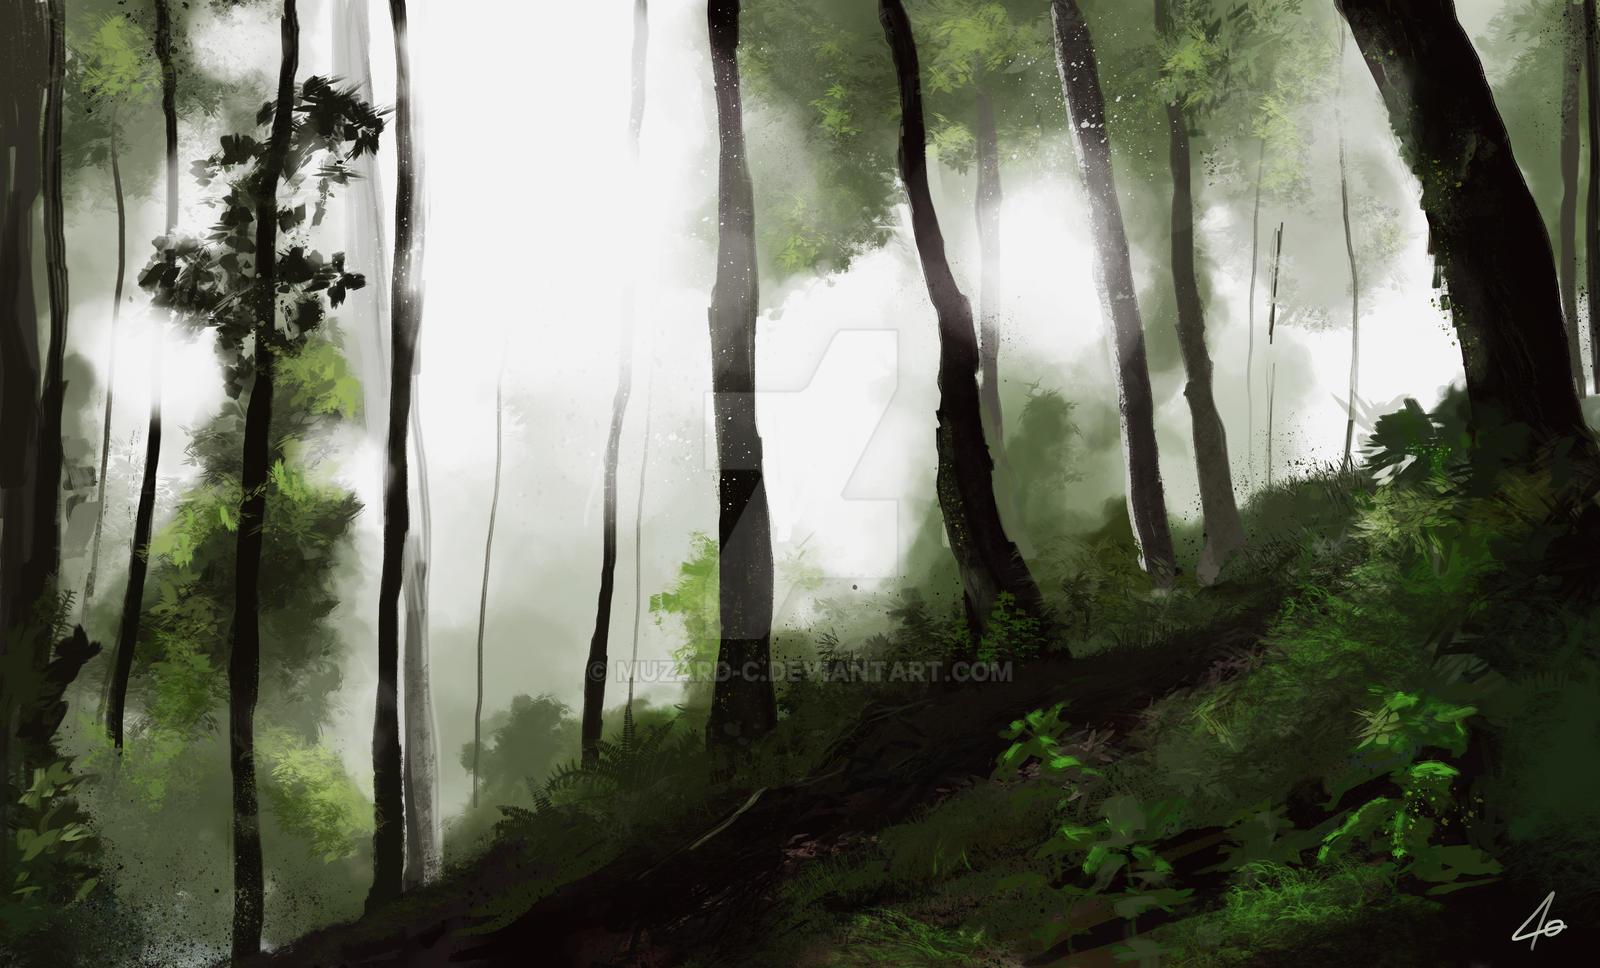 Speed Jungle by Muzard-C